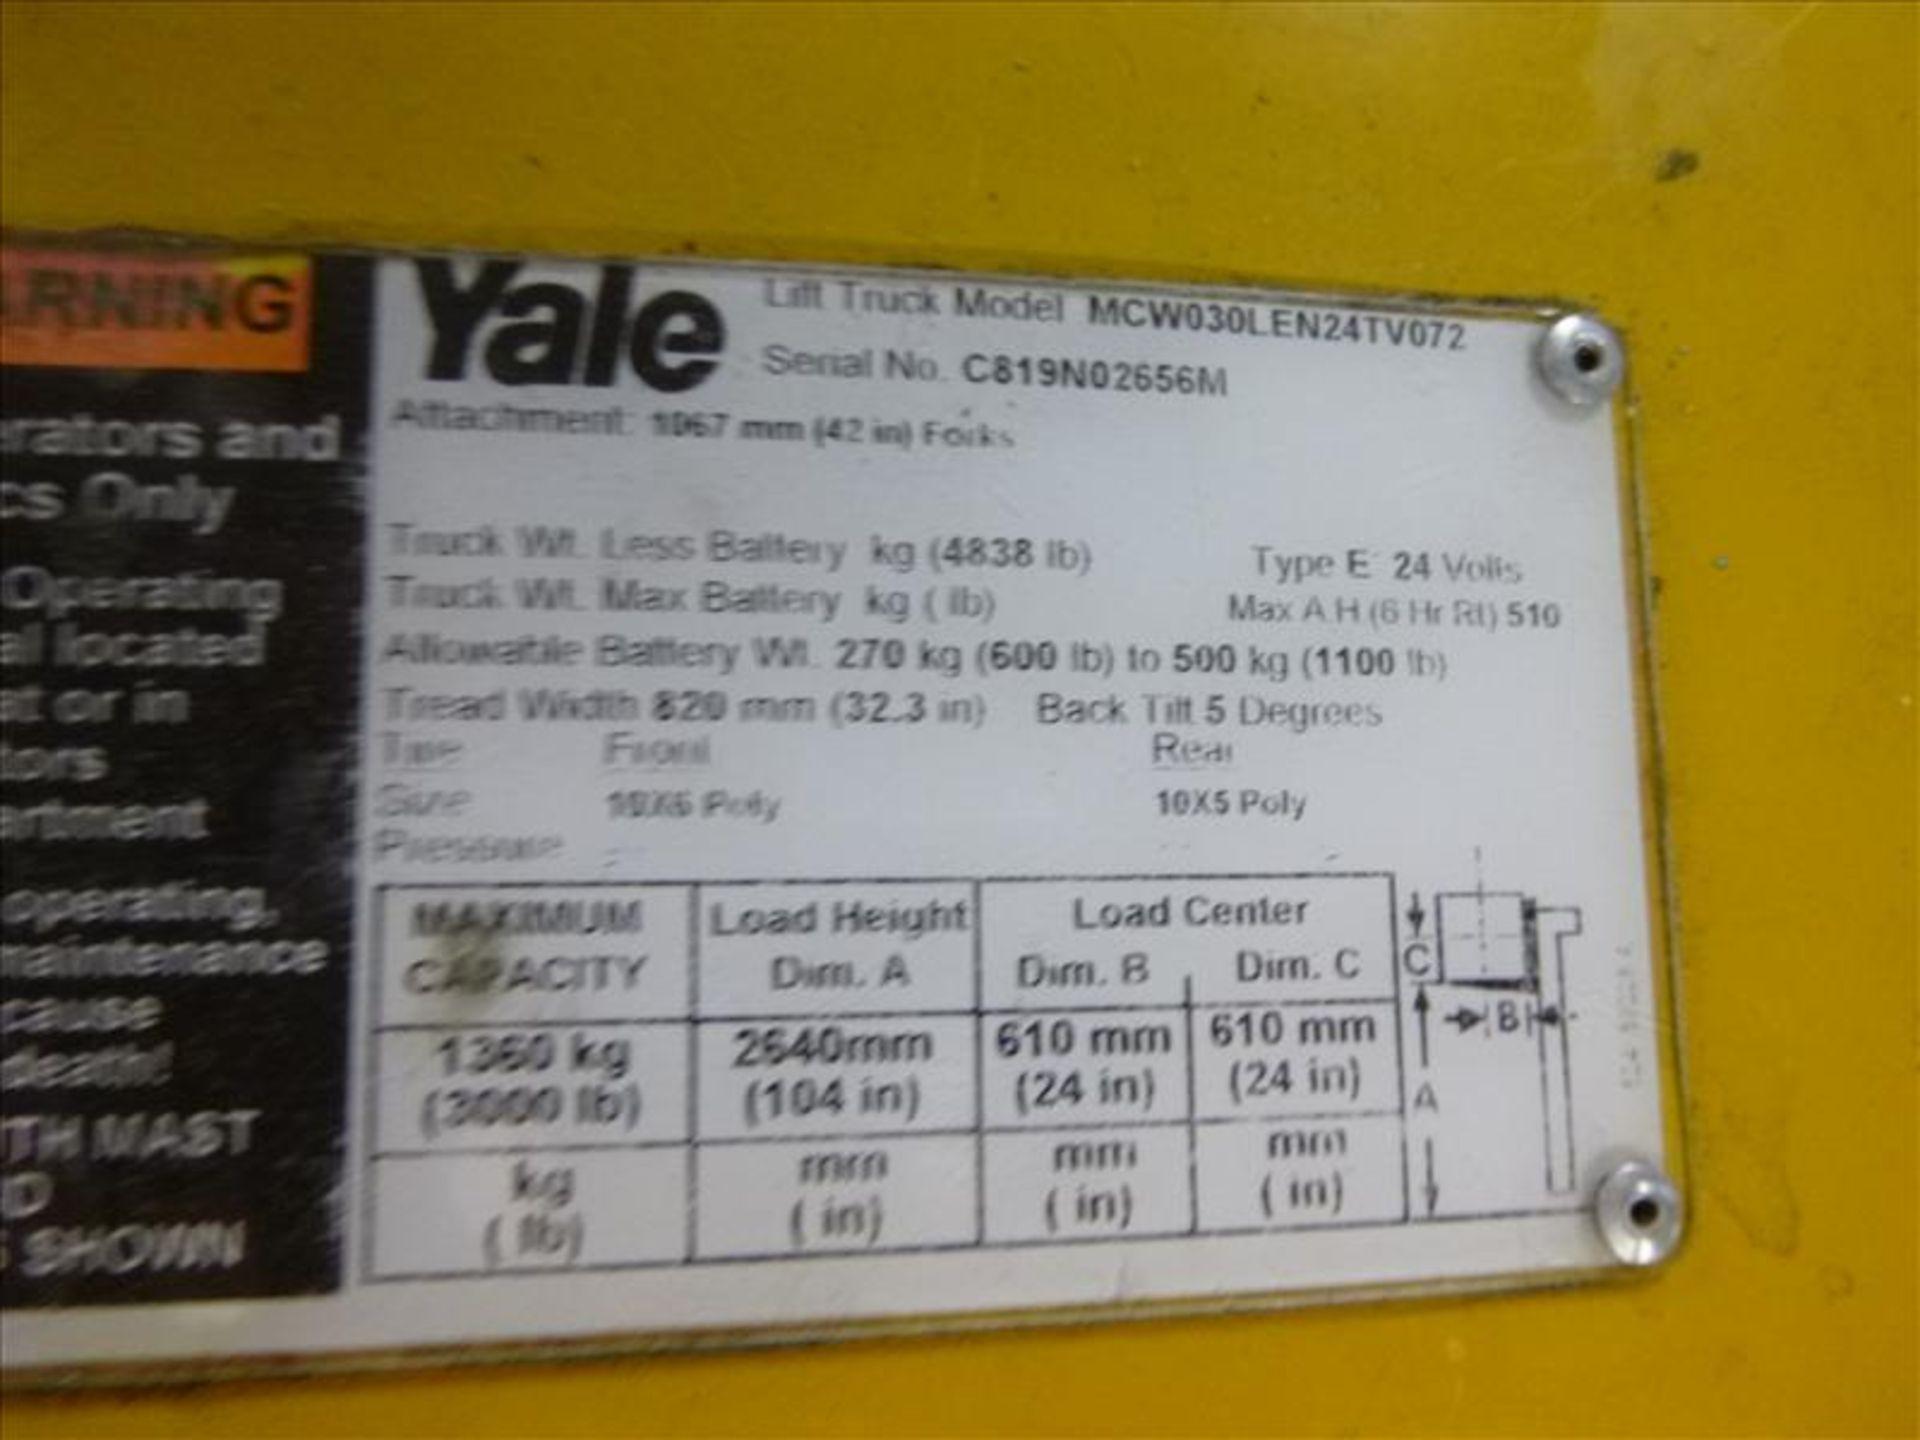 Lot 2026 - Yale walk-behind fork lift truck, mod. MCW030LEN24TV072, ser. no. C819N02656M, 24V electric, 3000